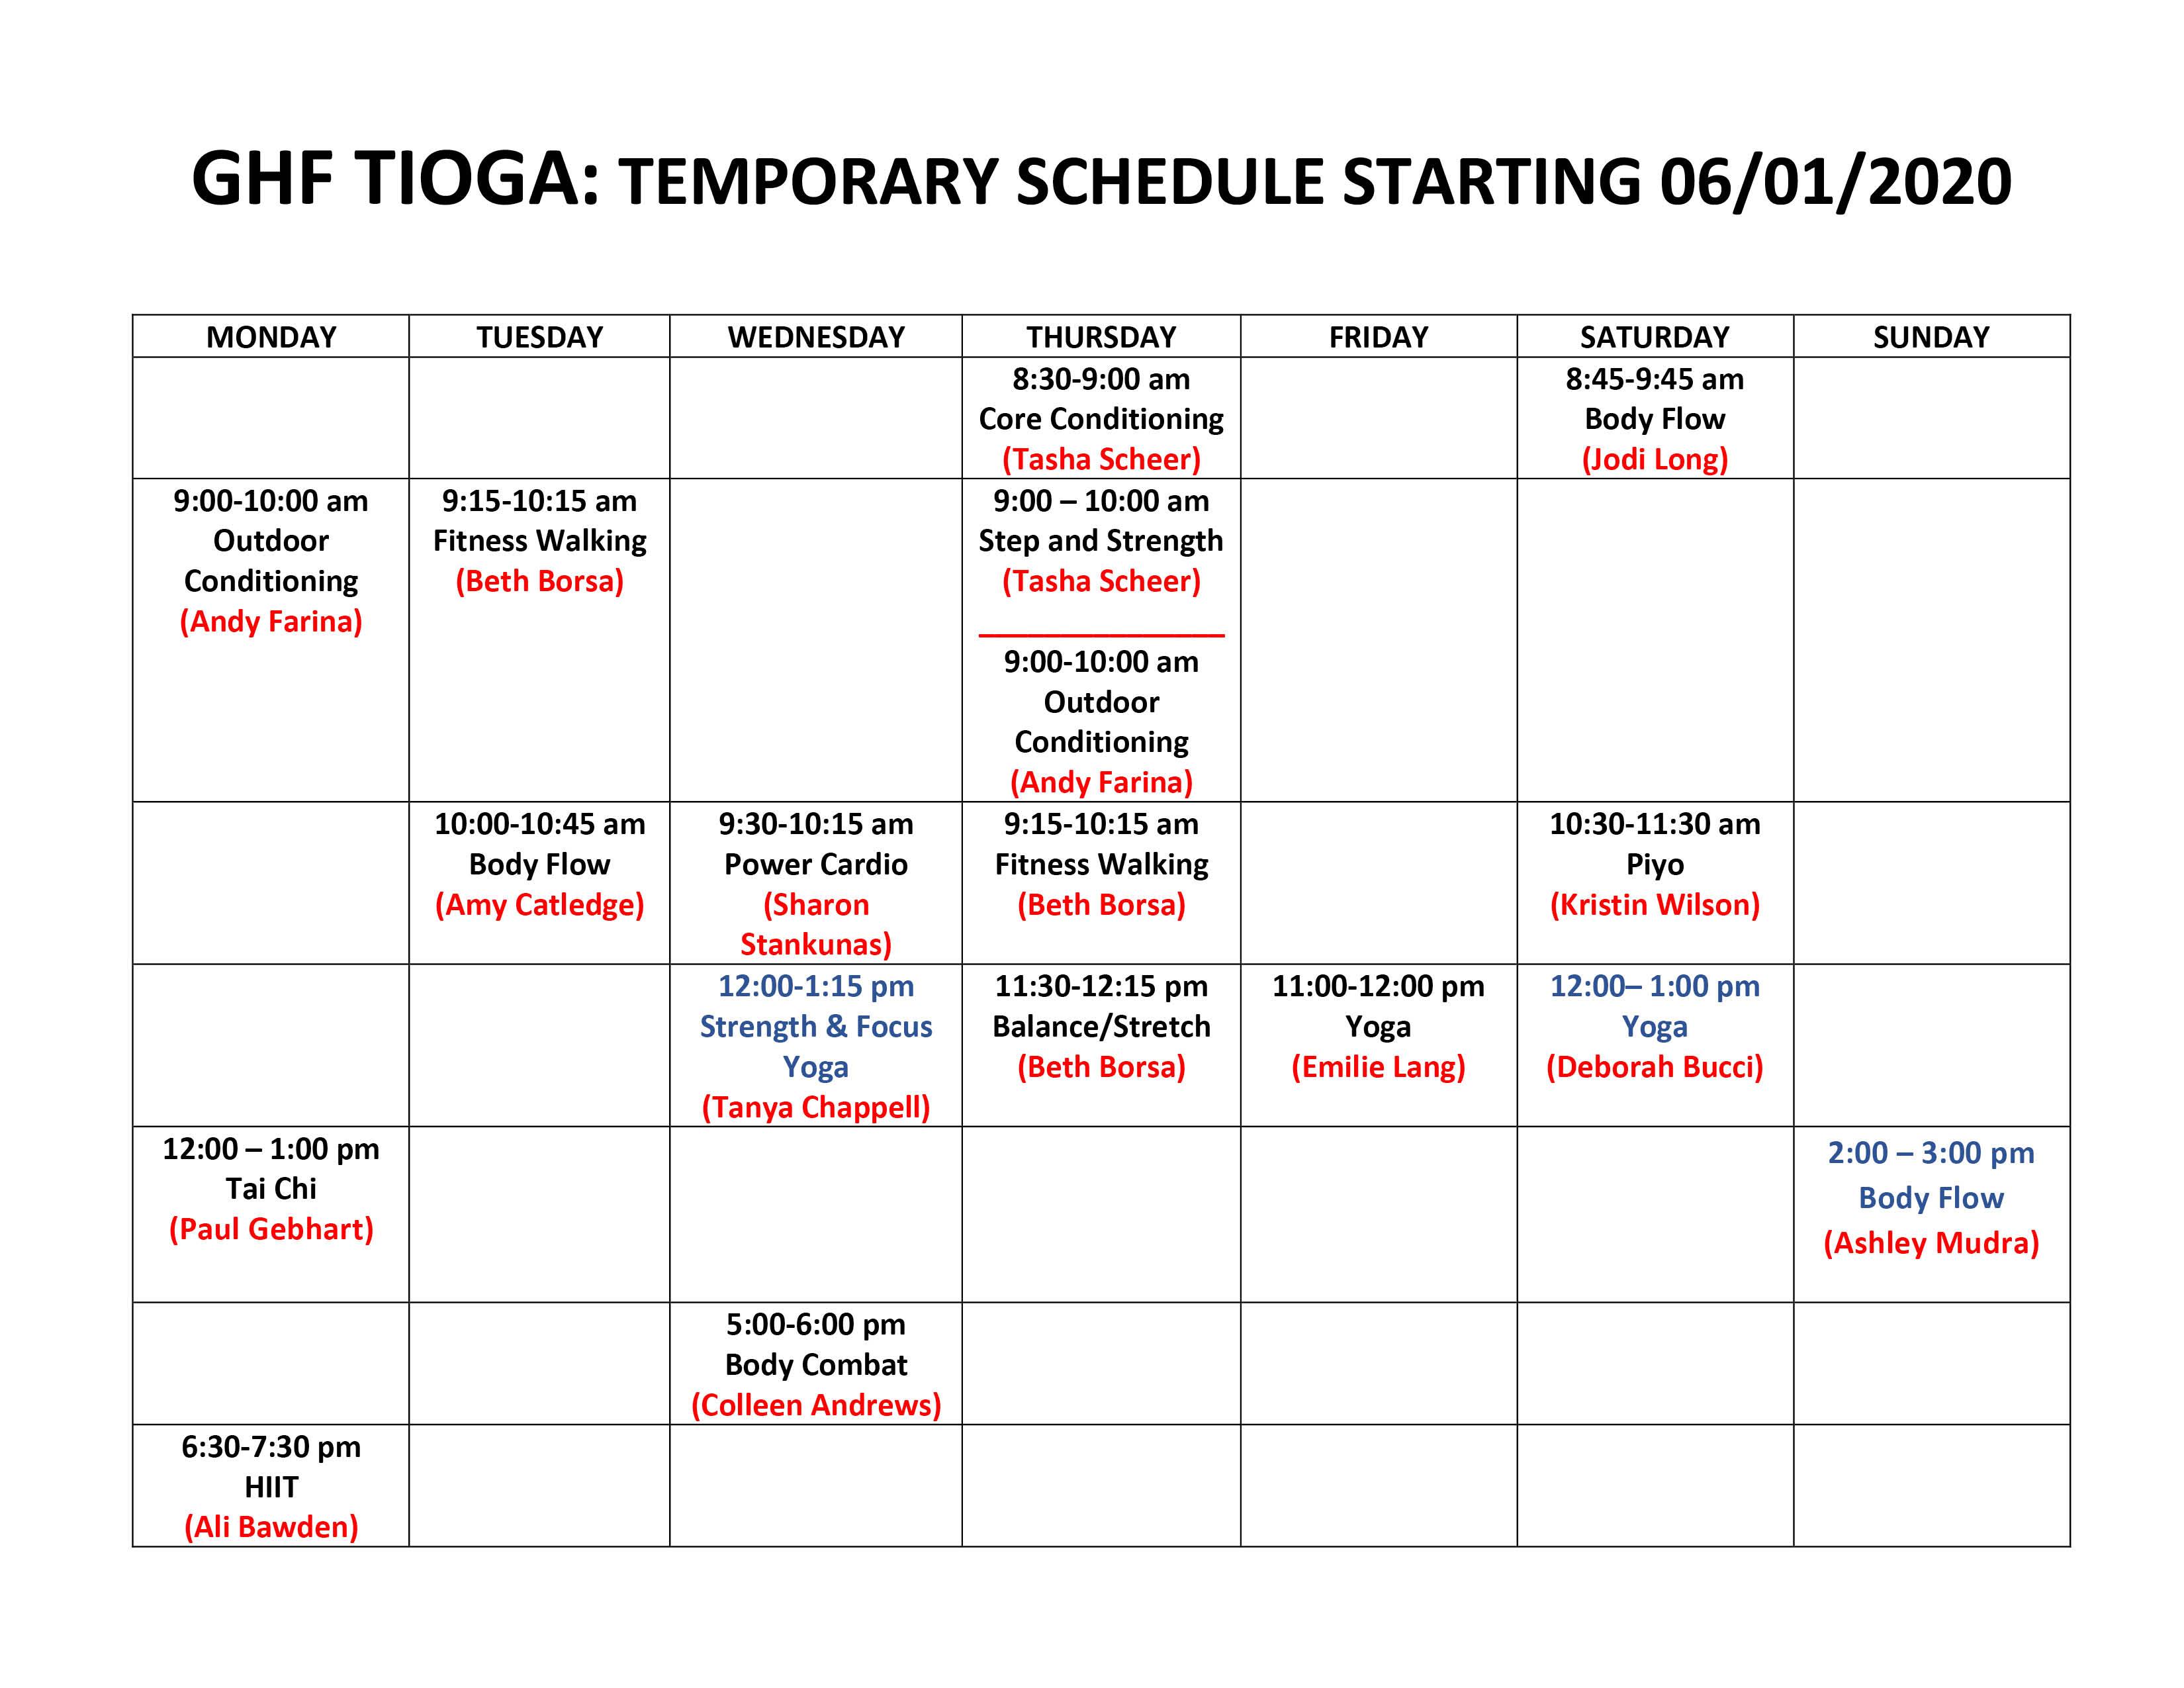 Tioga Schedule